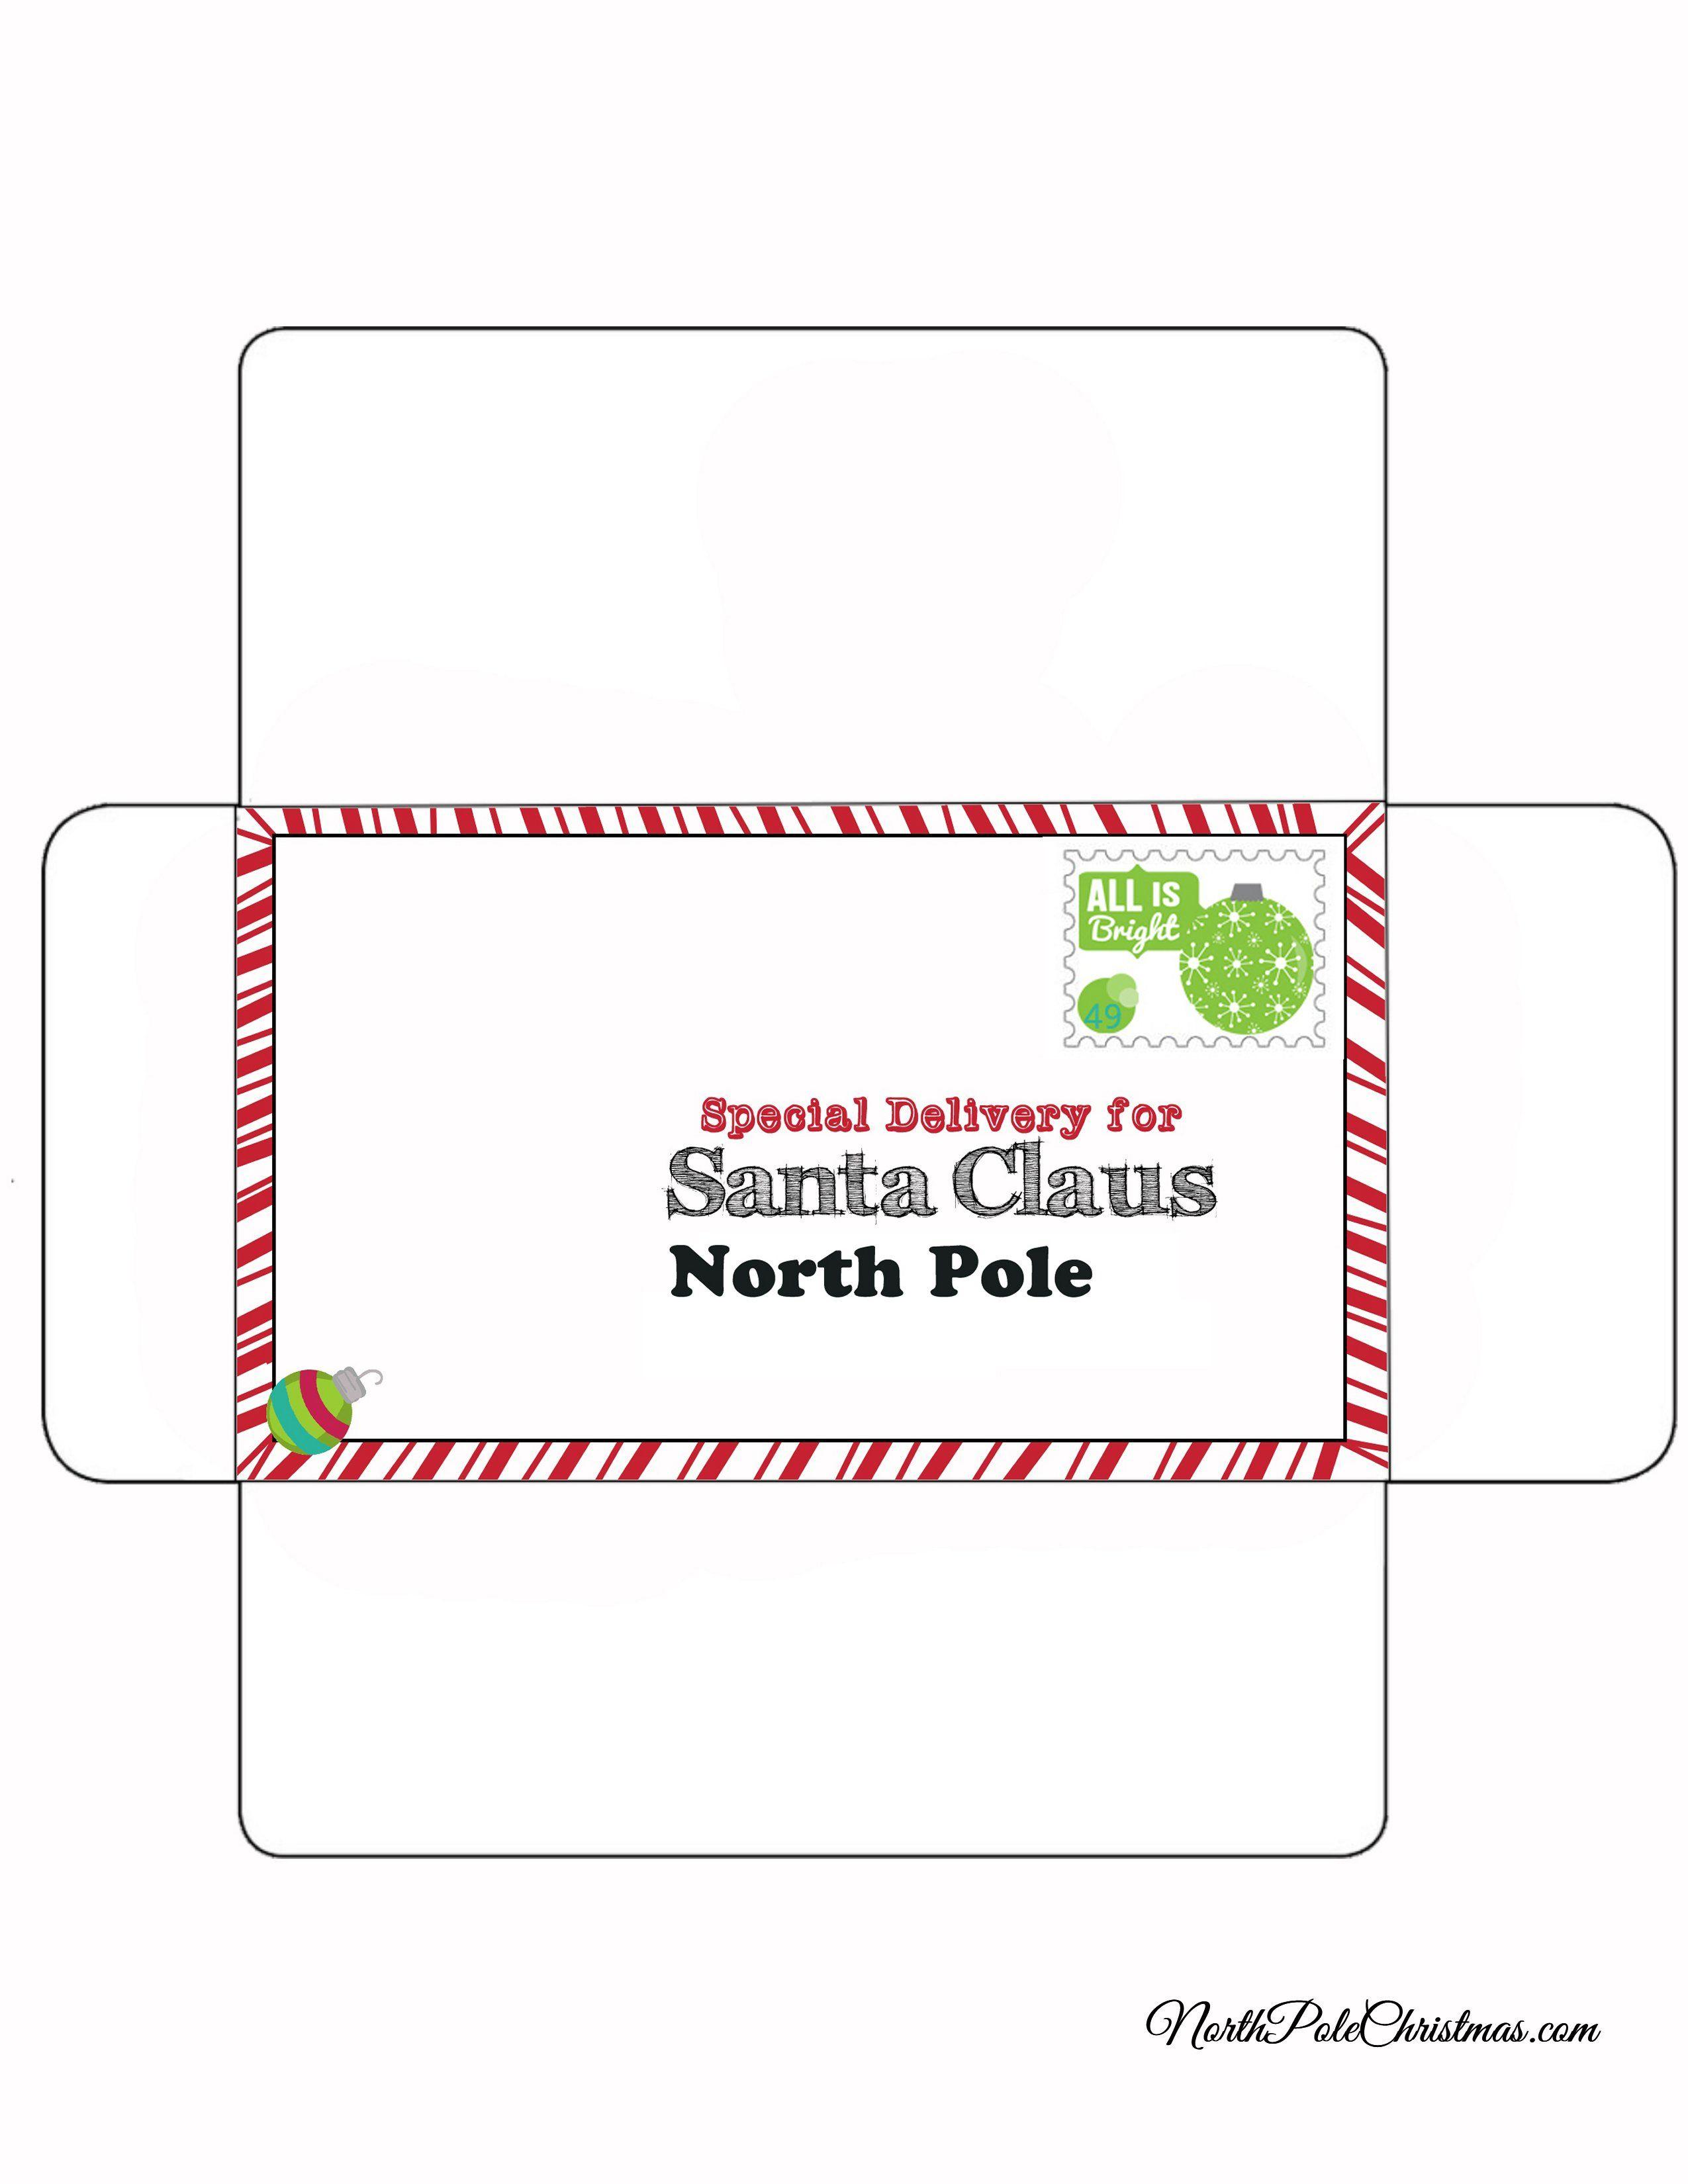 Free Envelope To Go With Your Child's Letter To Santa | Free - Free Printable Envelopes